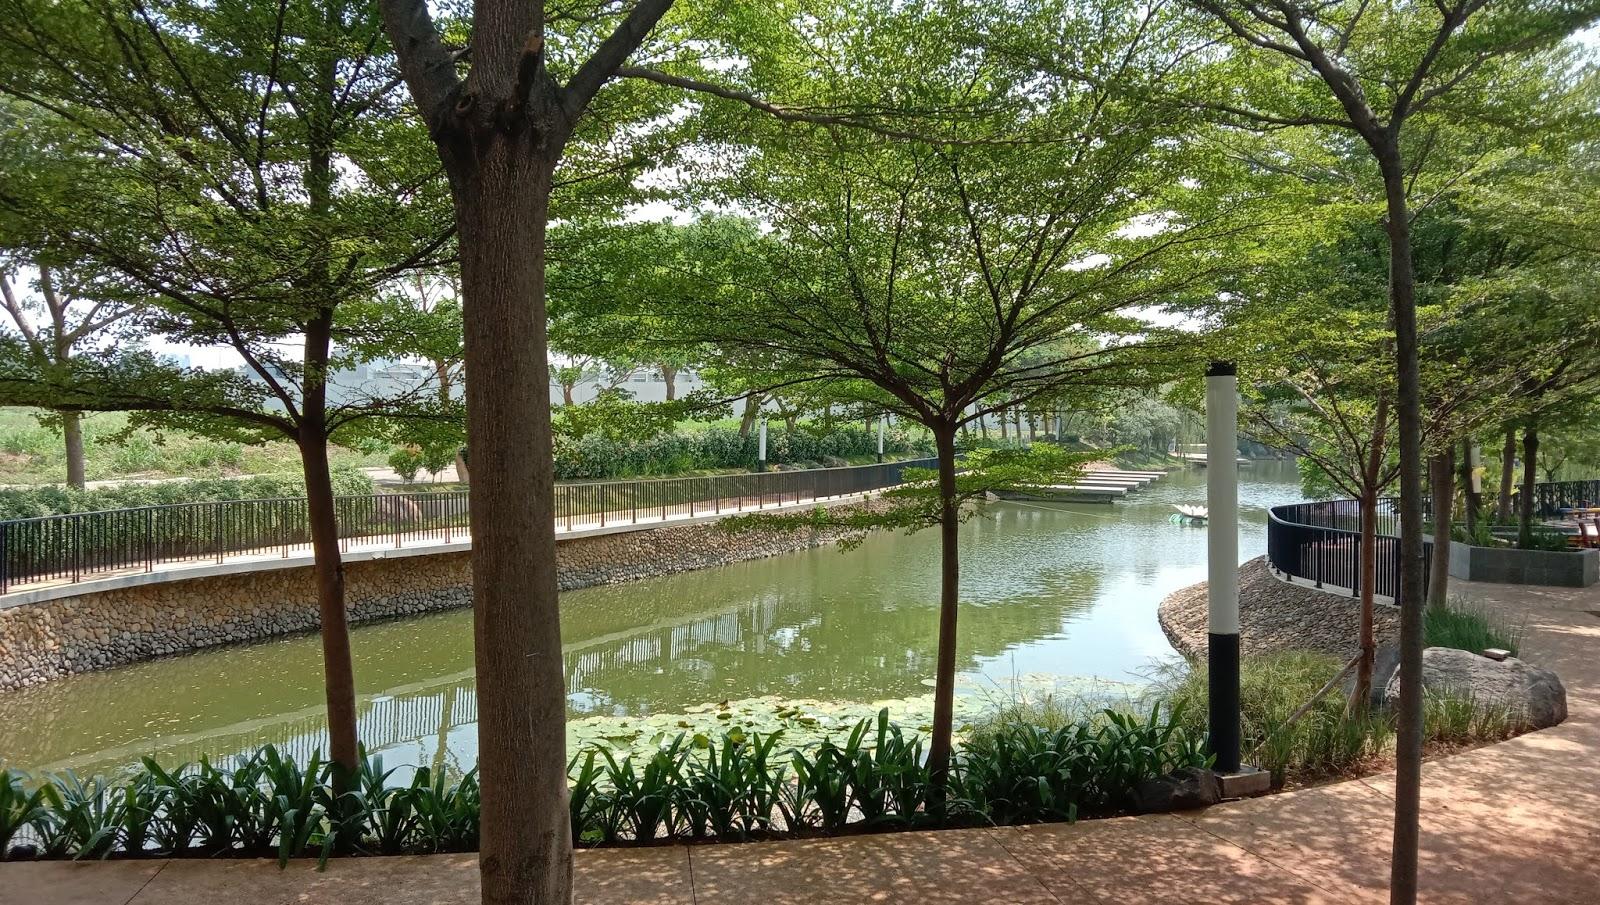 Danau Sedayu City